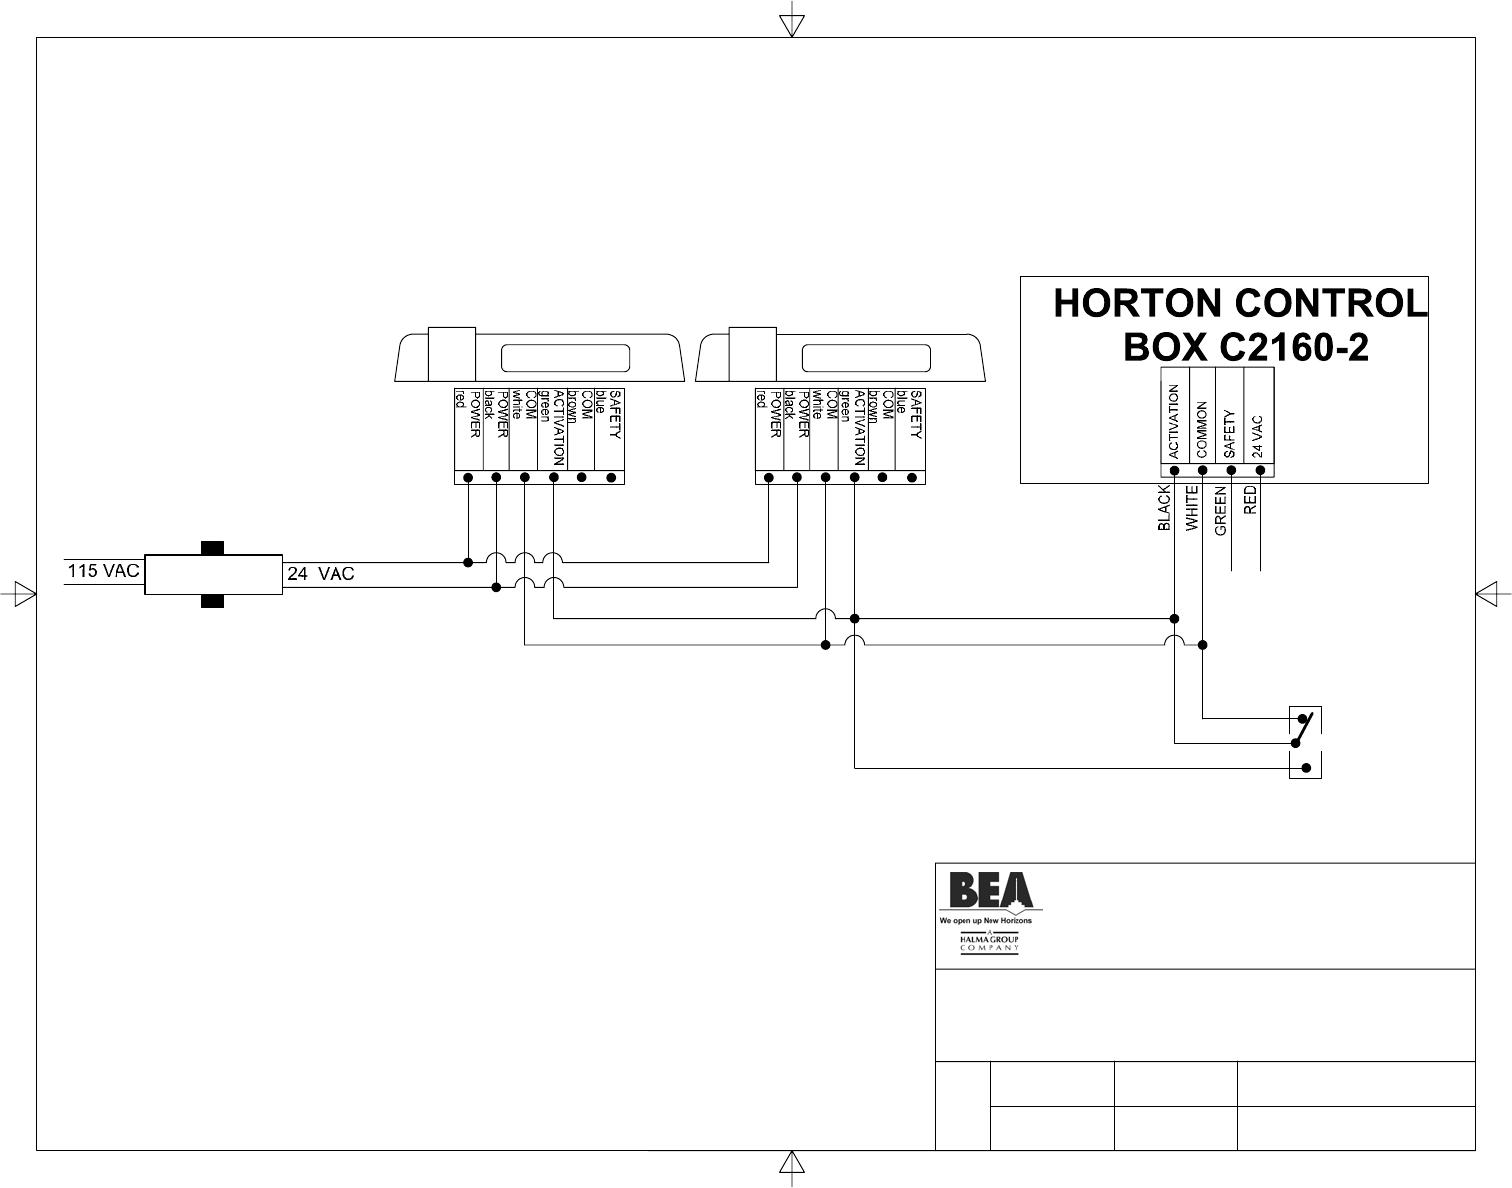 bgb bea 80 0091 02, c2150 manual title horton c2160 2 with wizard ii horton door operator wiring diagrams at gsmx.co